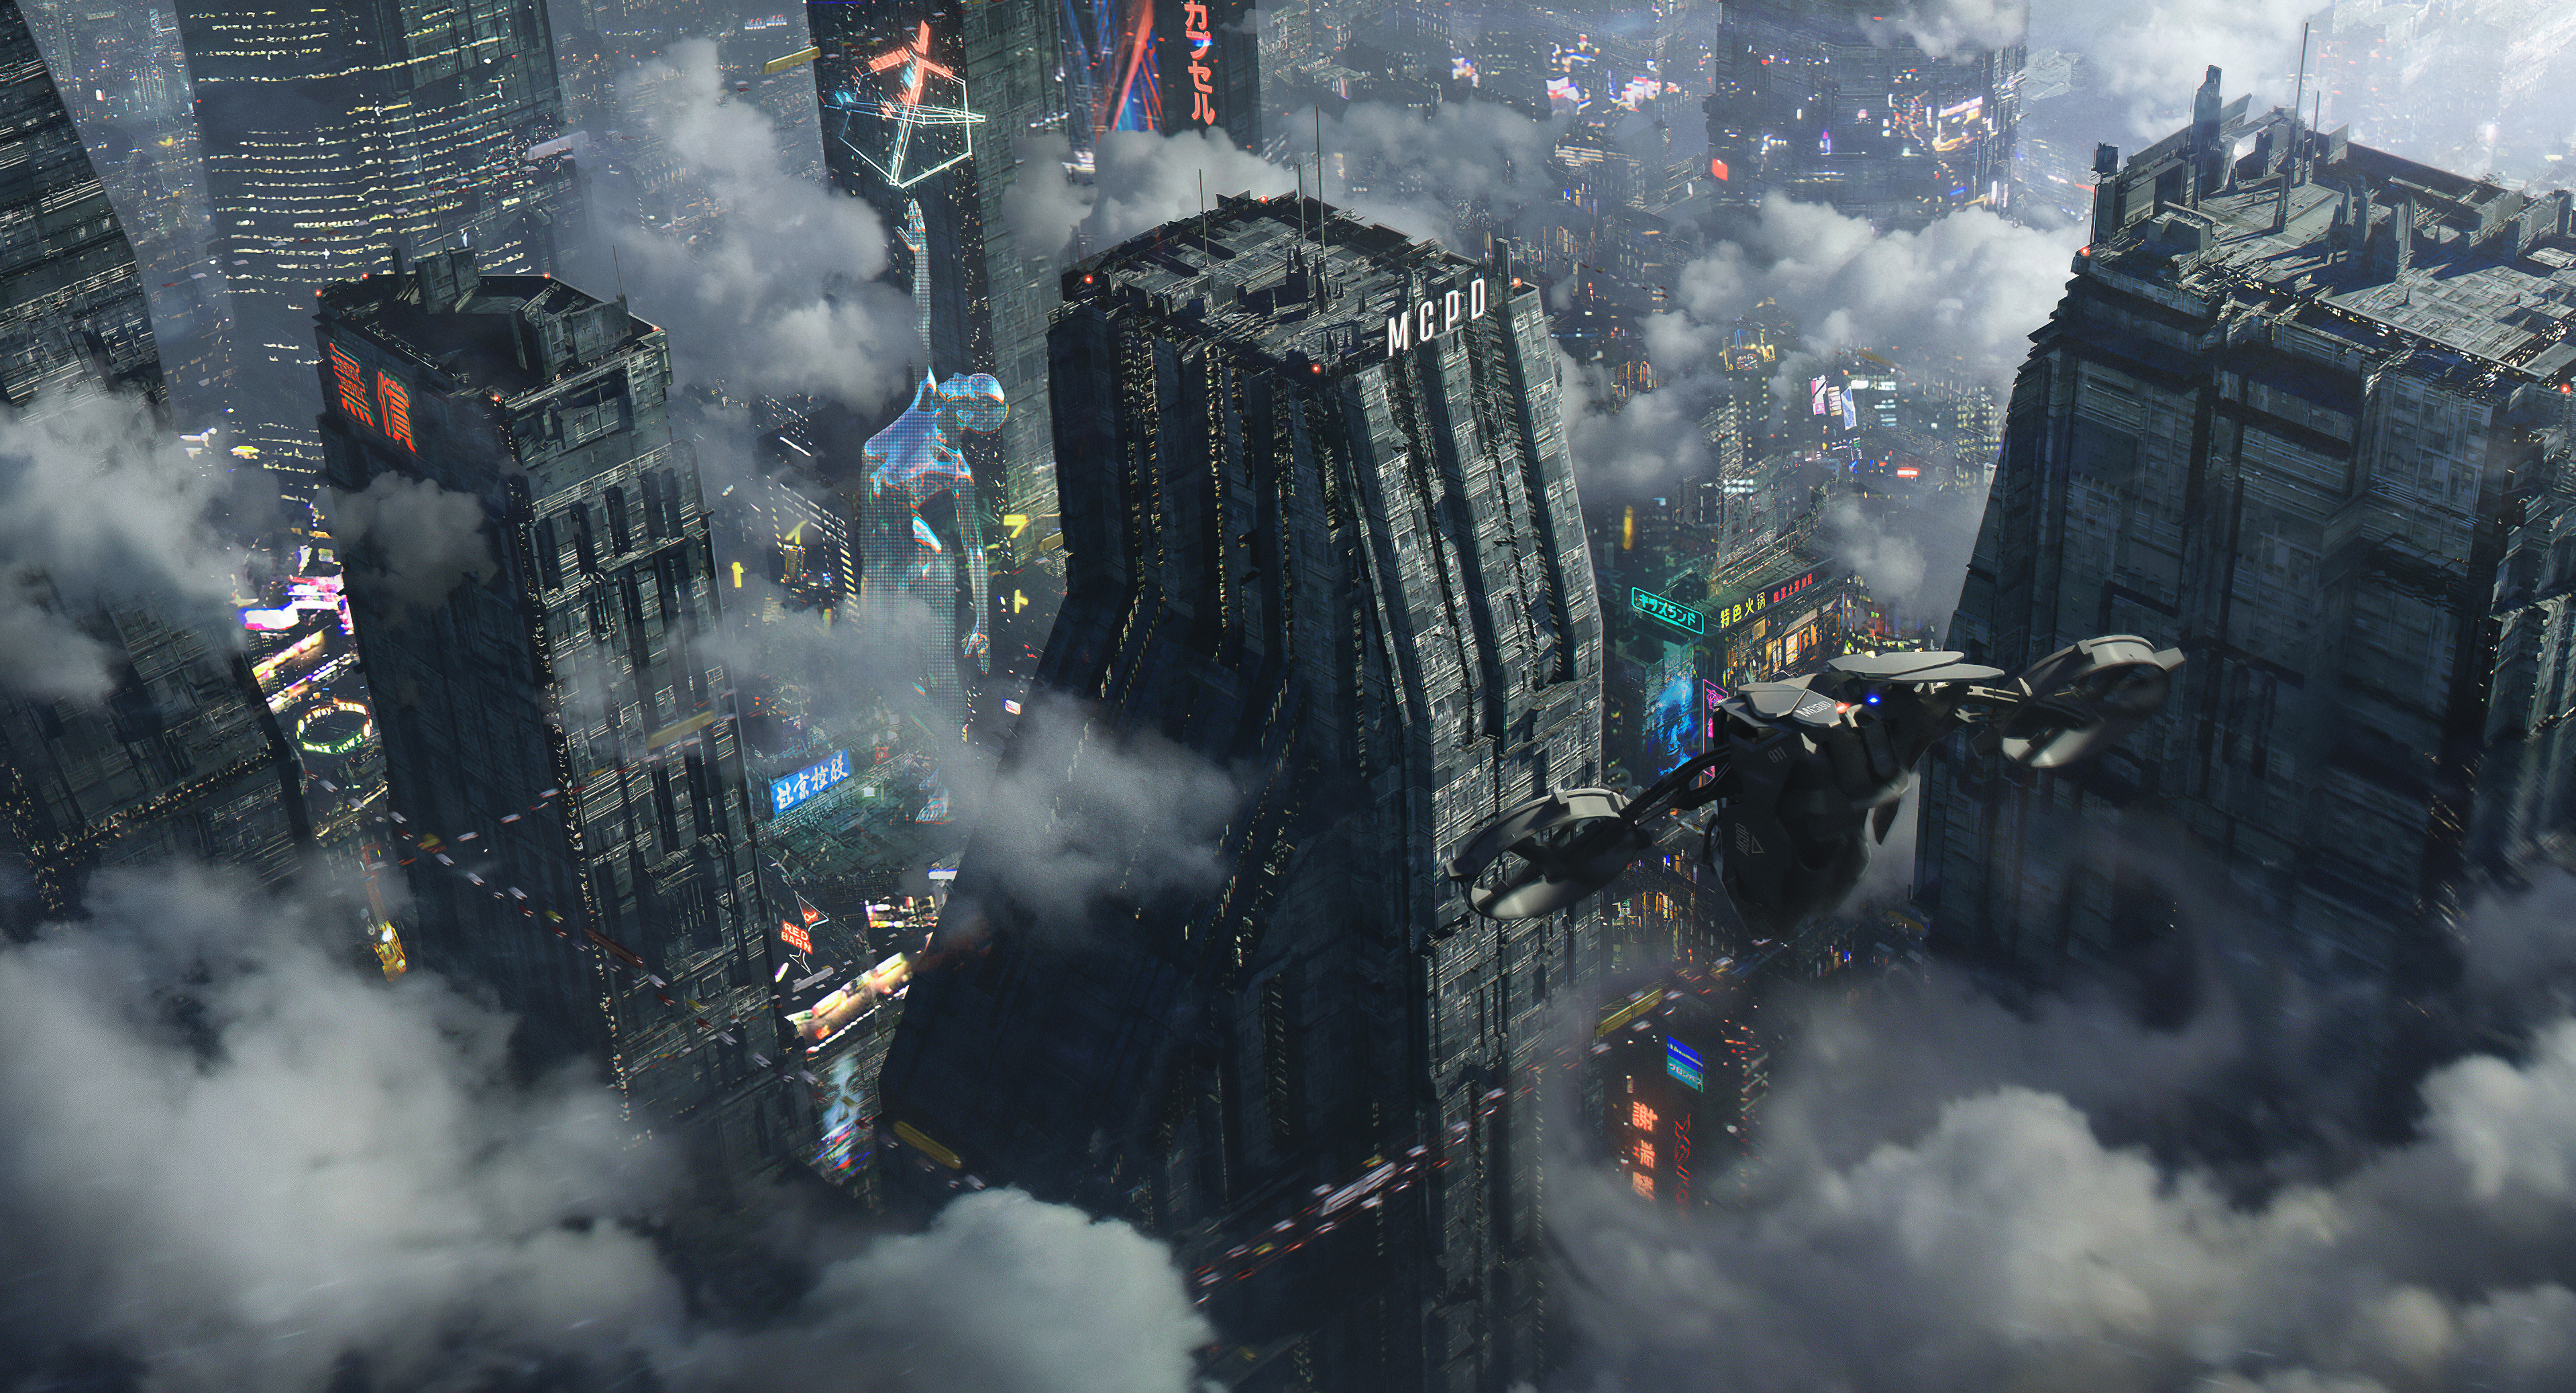 General 3840x2076 Nikita Pilyukshin futuristic city city clouds skyscraper aircraft